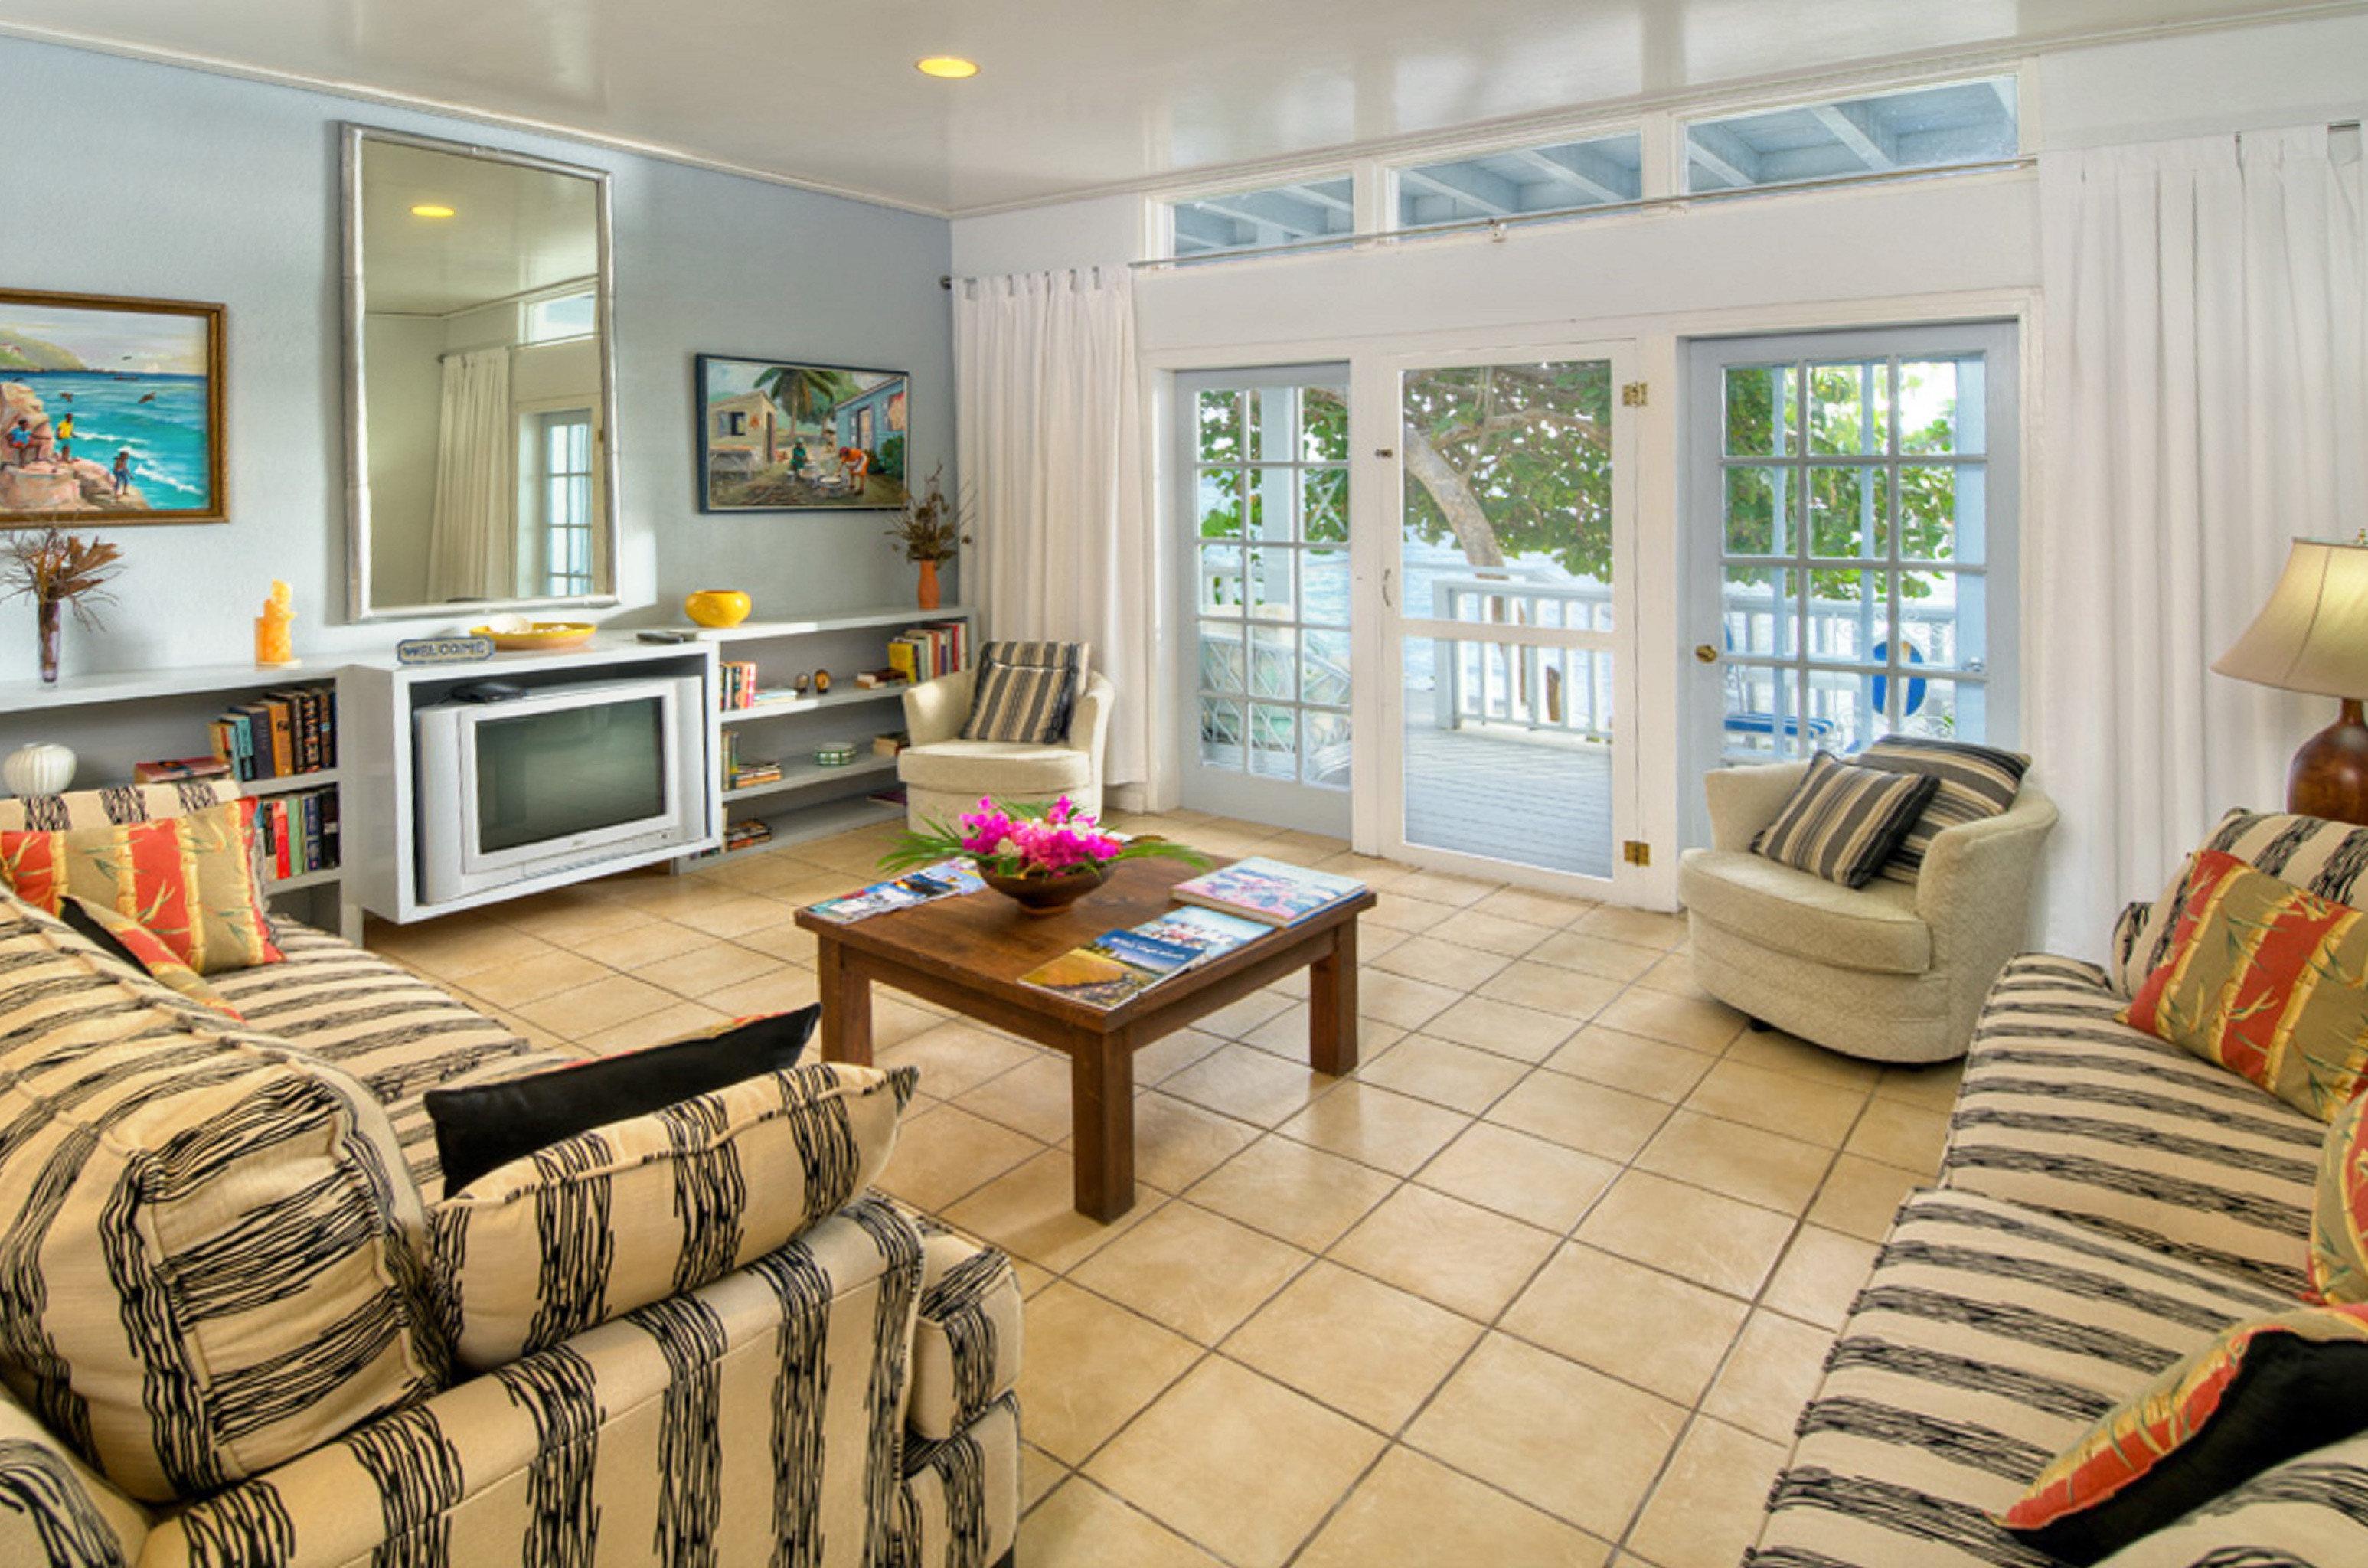 Balcony Modern Scenic views Suite sofa living room property home condominium hardwood cottage Bedroom leather